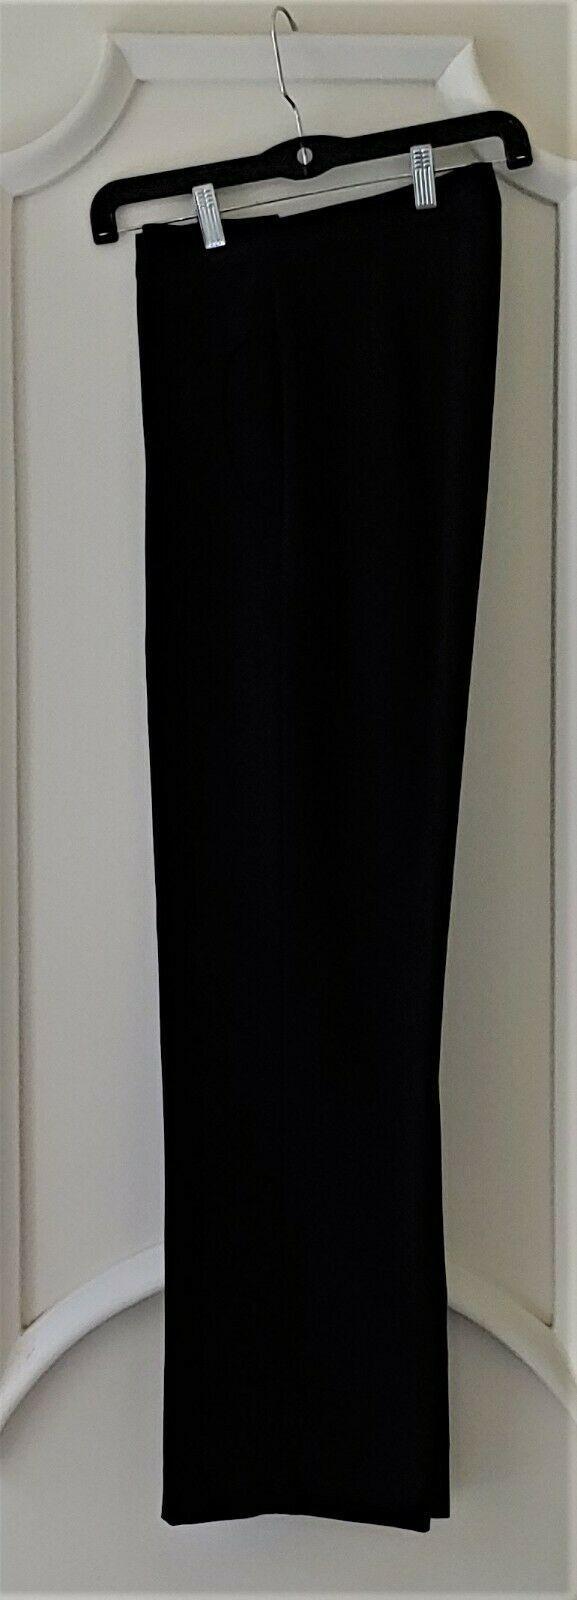 Stylish Women's Golf & Resort Black Long Sleeve Collar Top, Swarovski Buttons  image 9